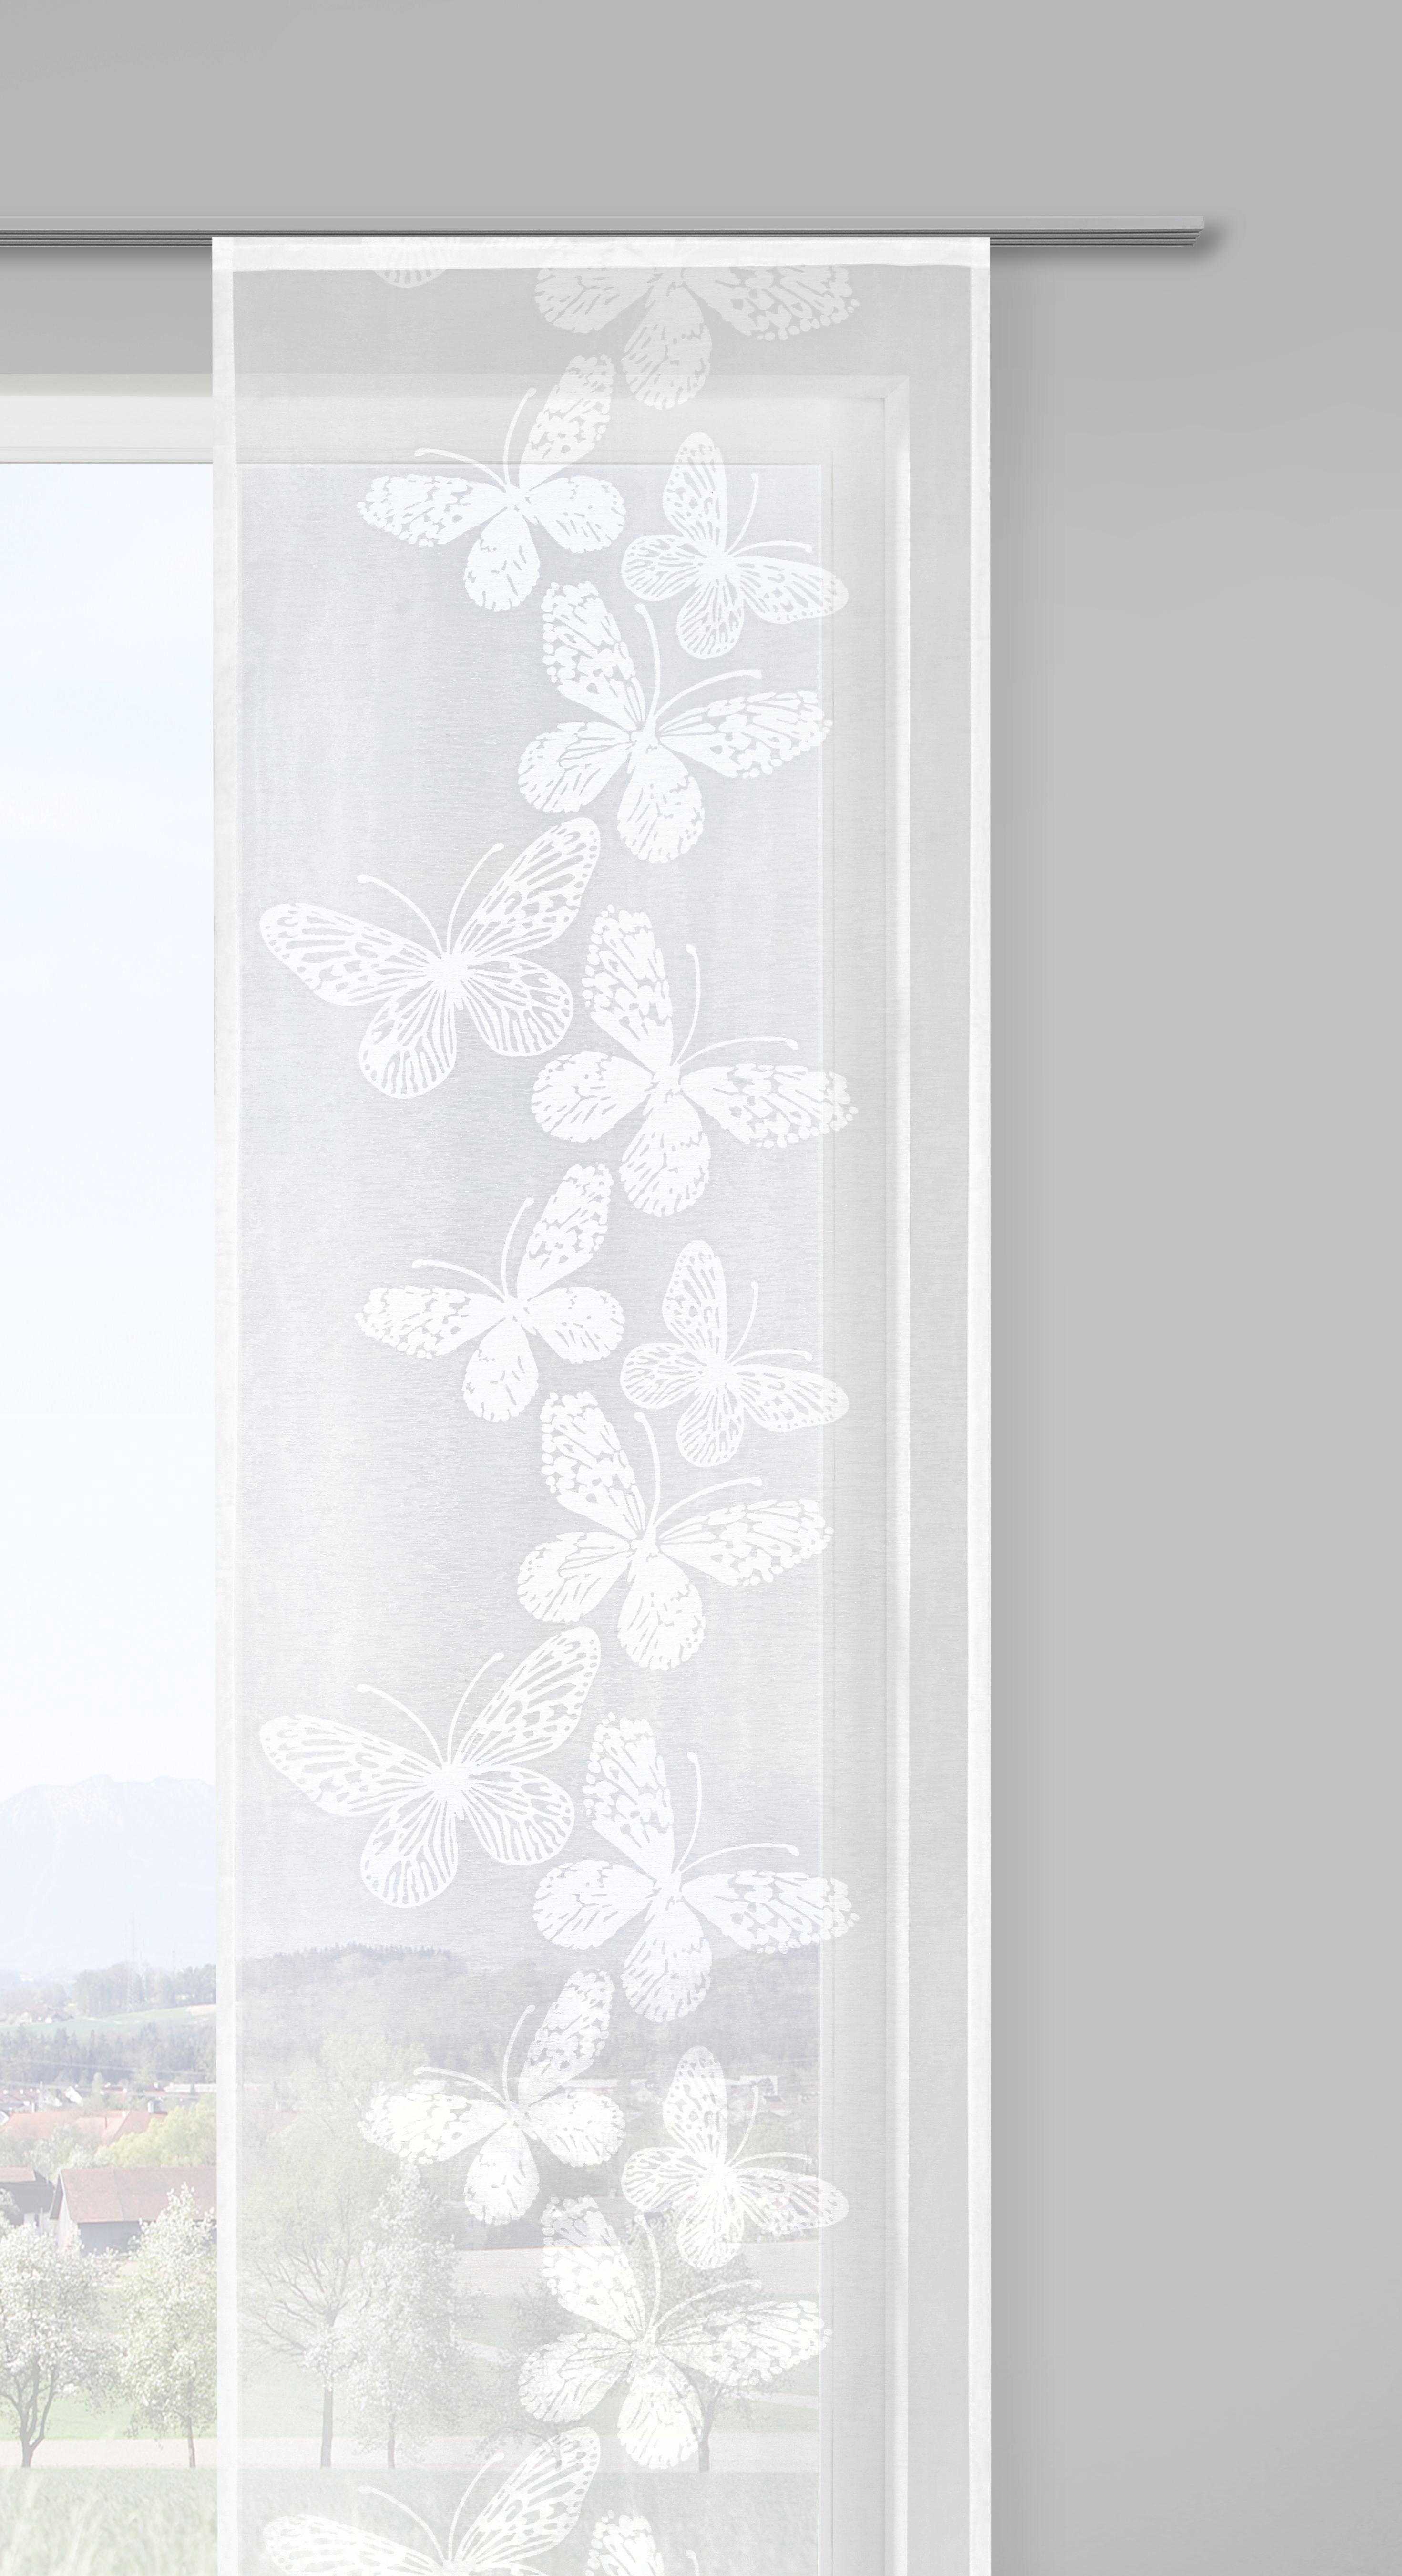 Lapfüggöny Papillon - fehér, romantikus/Landhaus, textil (60/245cm) - MÖMAX modern living